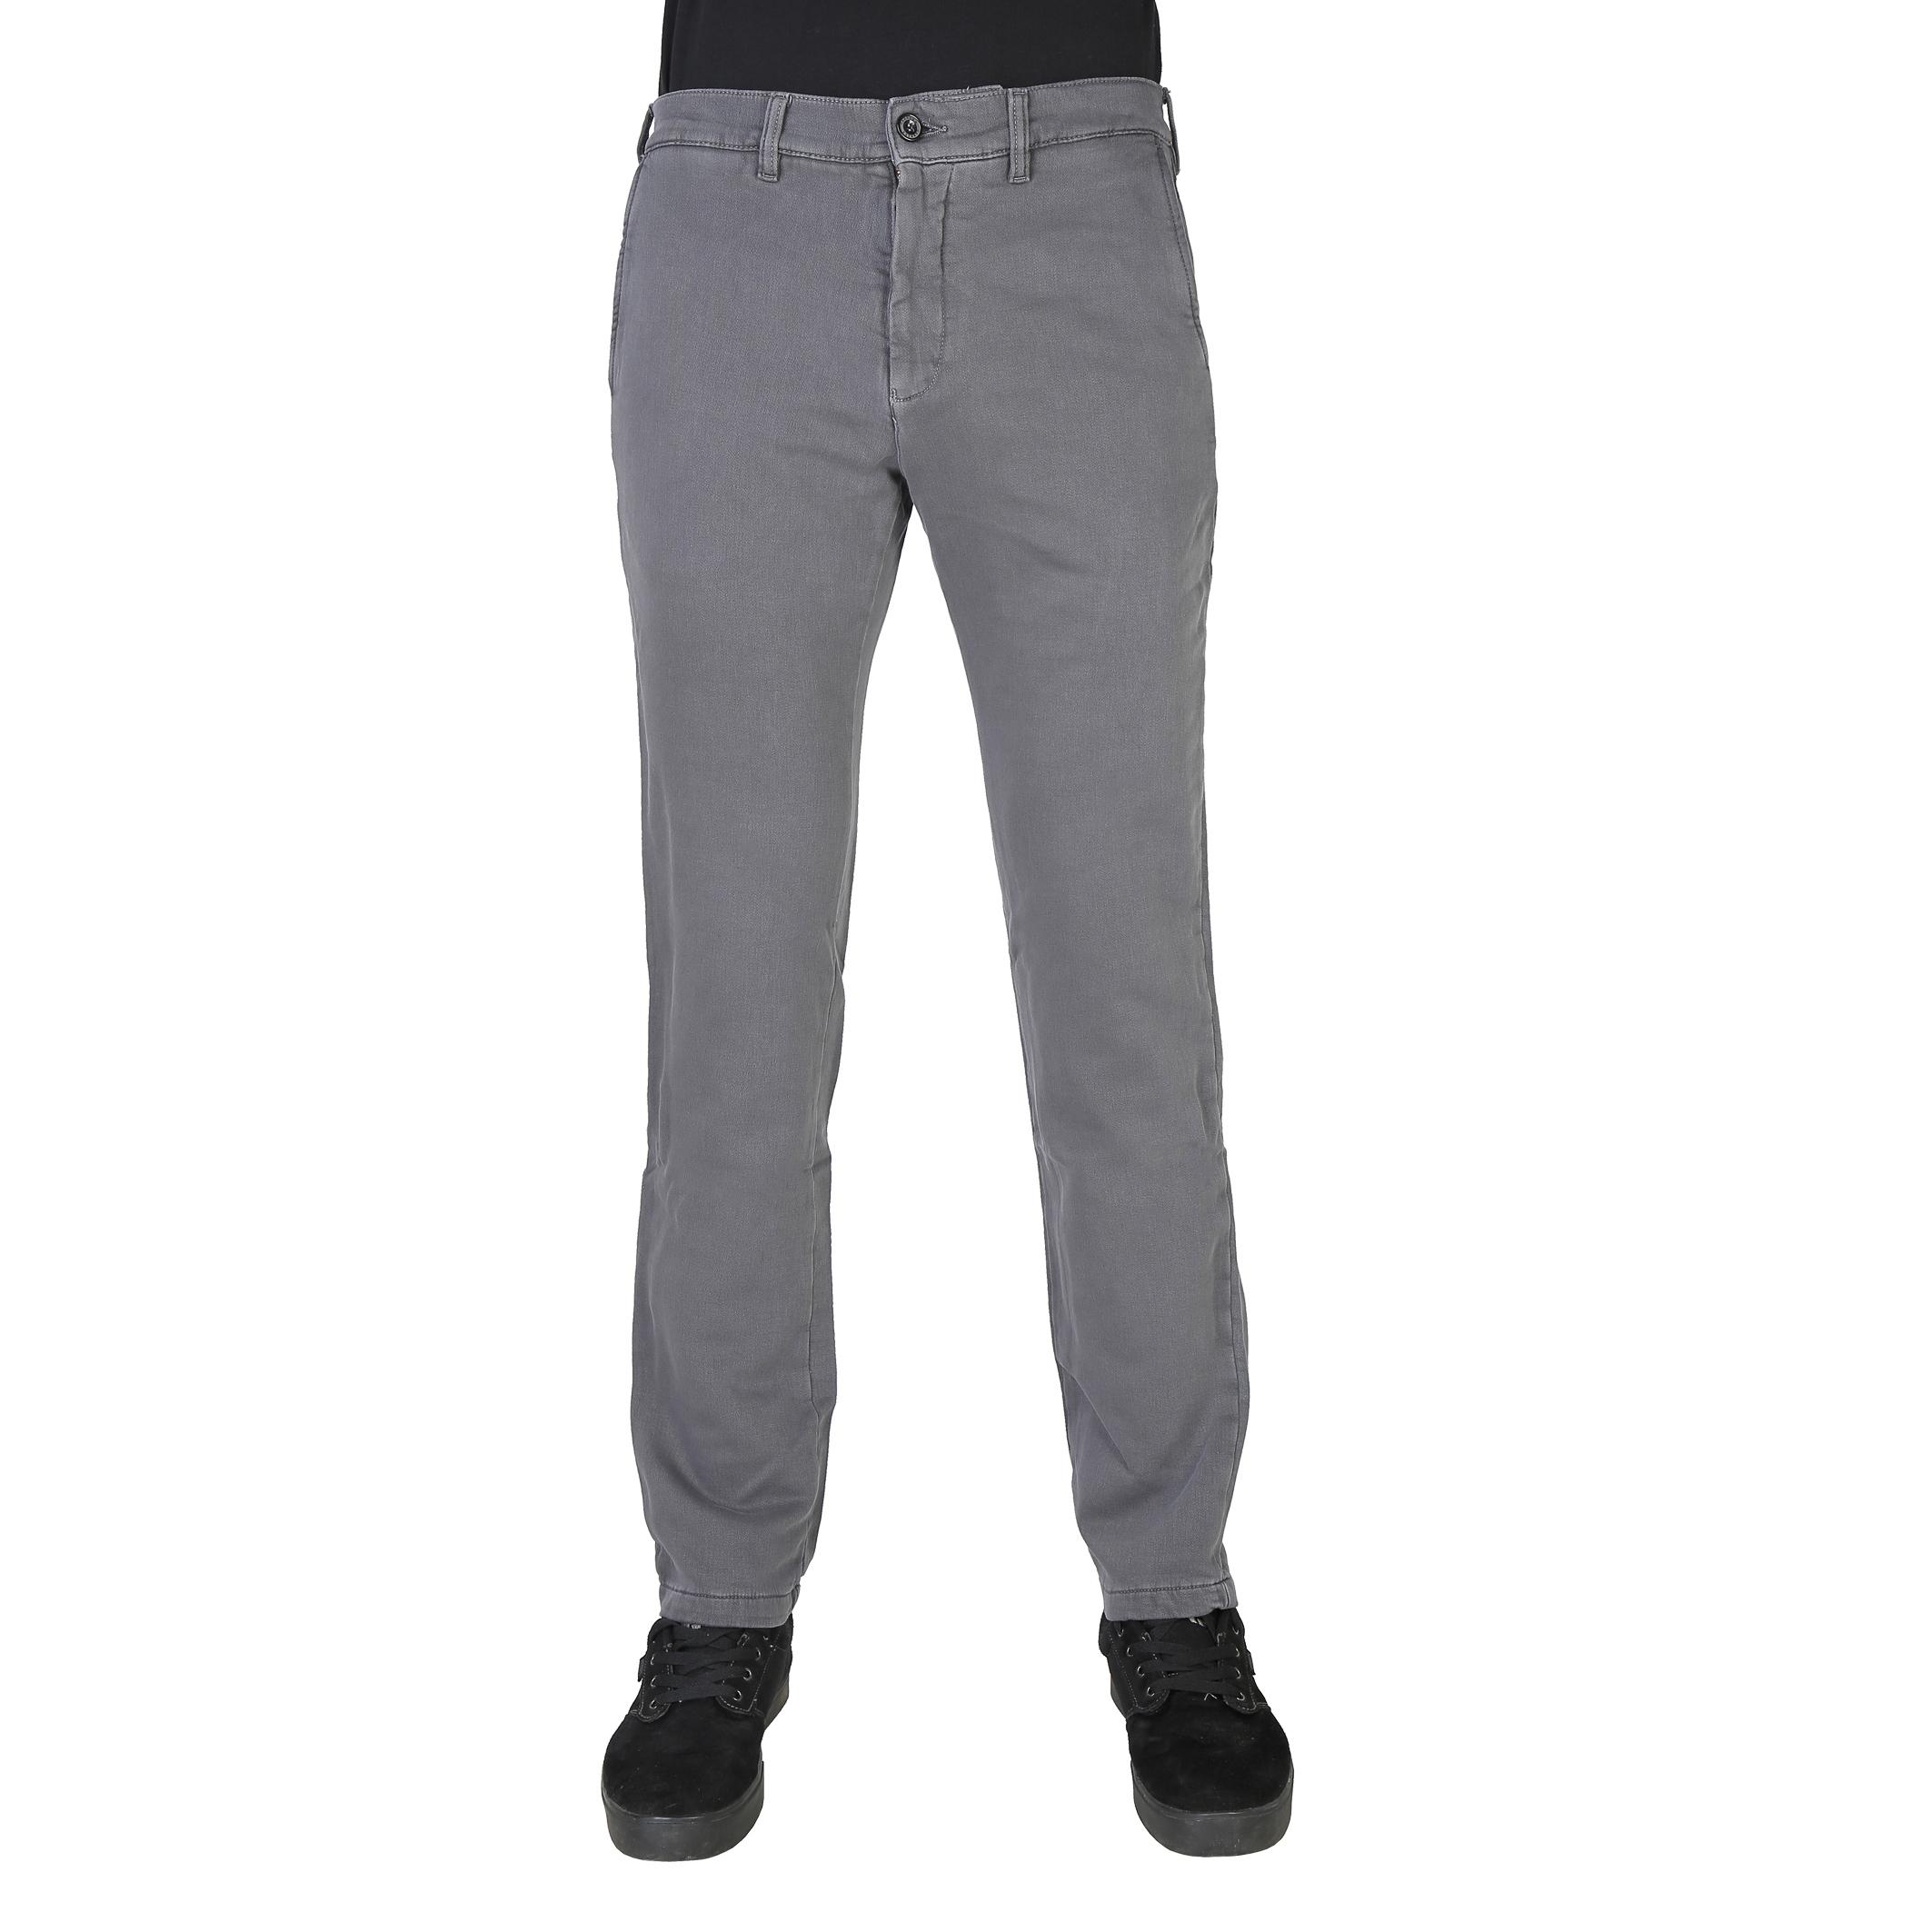 Pantaloni in Jeans Uomo Grigio Carrera Jeans Jeans 000717/_8302A